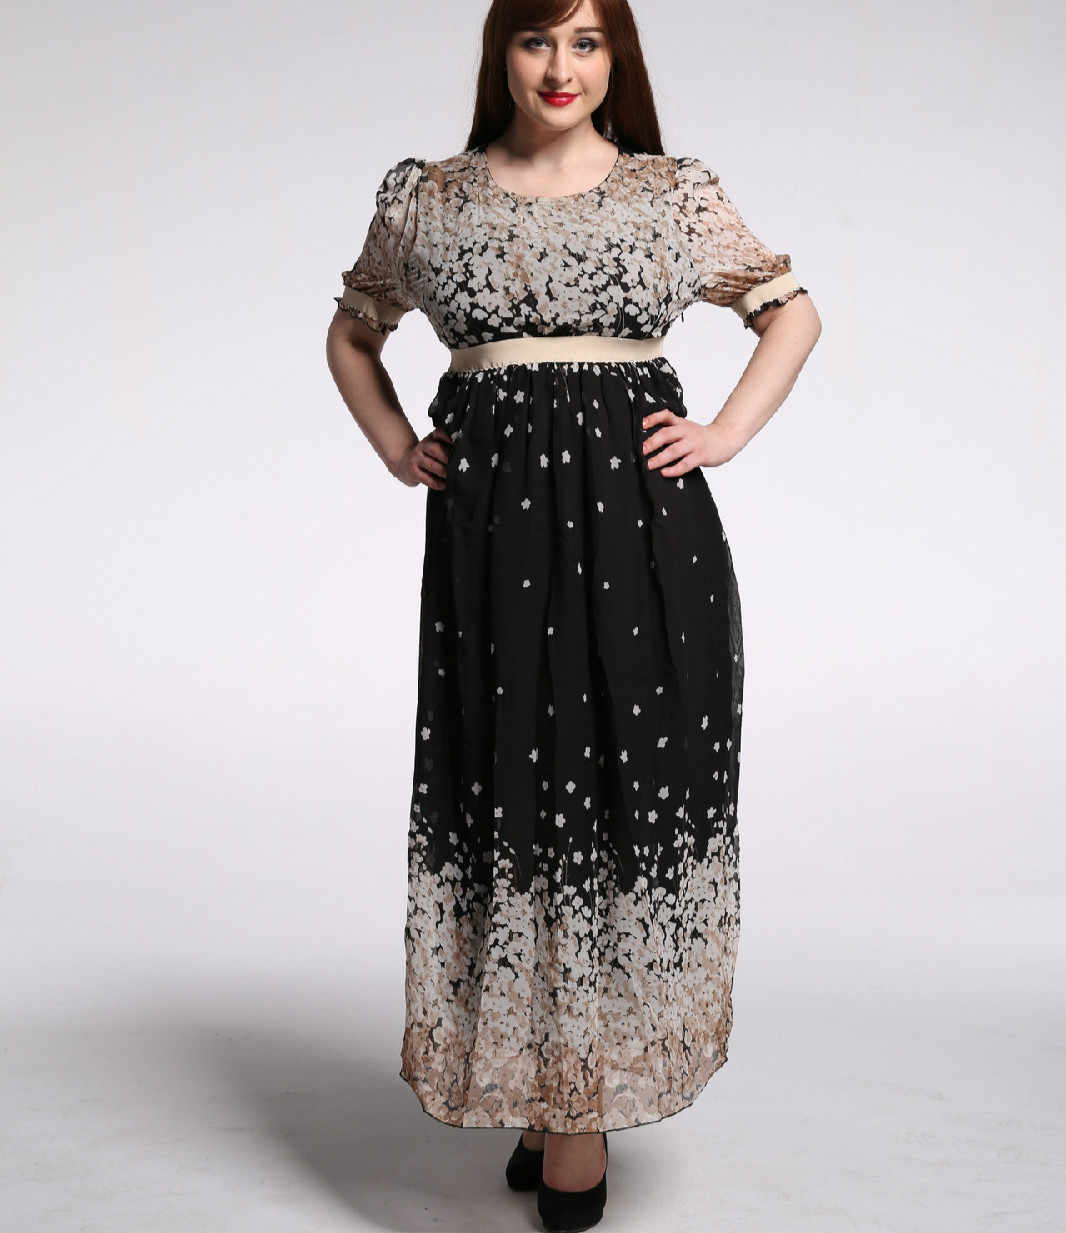 91eafe7047 TUHAO Print Puff Sleeve Big Size Woman Dress Maxi Long Floral Sweet Elegant  Women s Dresses Plus